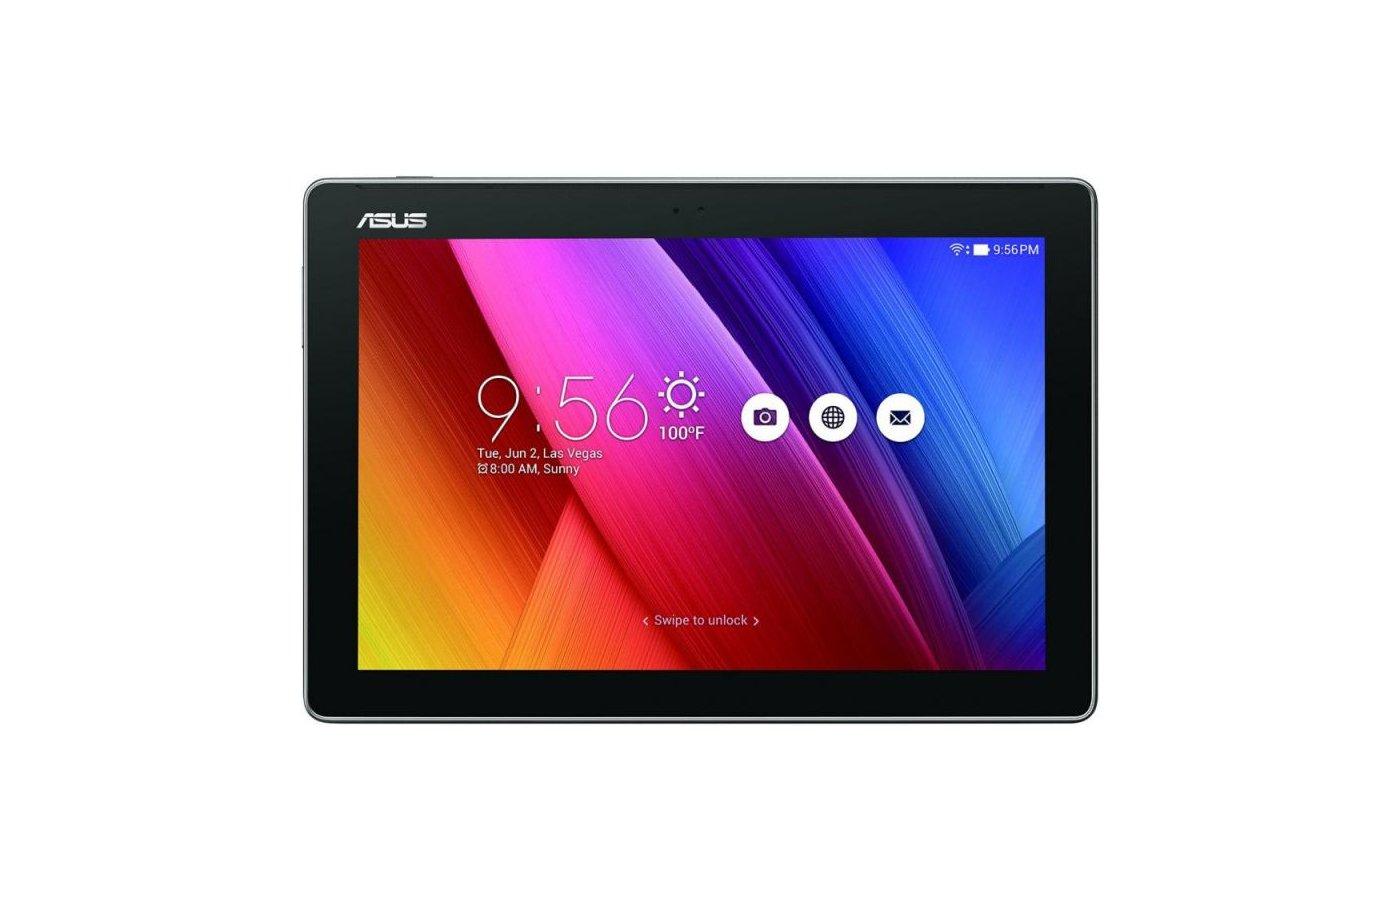 Планшет ASUS Z300CG-1A047A (10.1) intel X3-C3230/8GB/3G/Black /90NP0211-M01500/